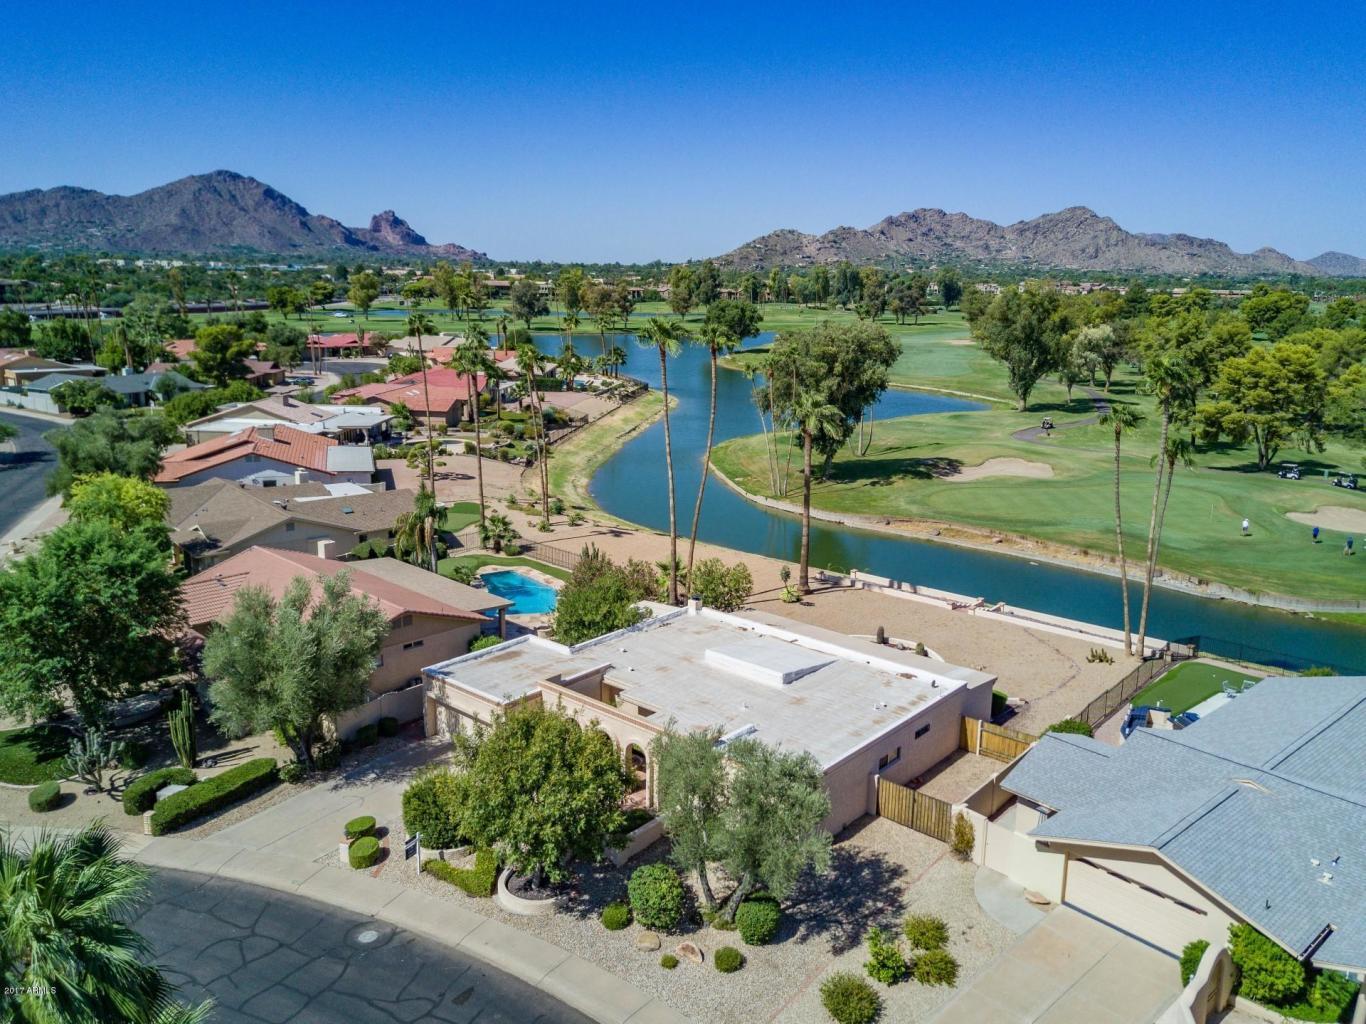 7136 N 78th St, Scottsdale | $605,000